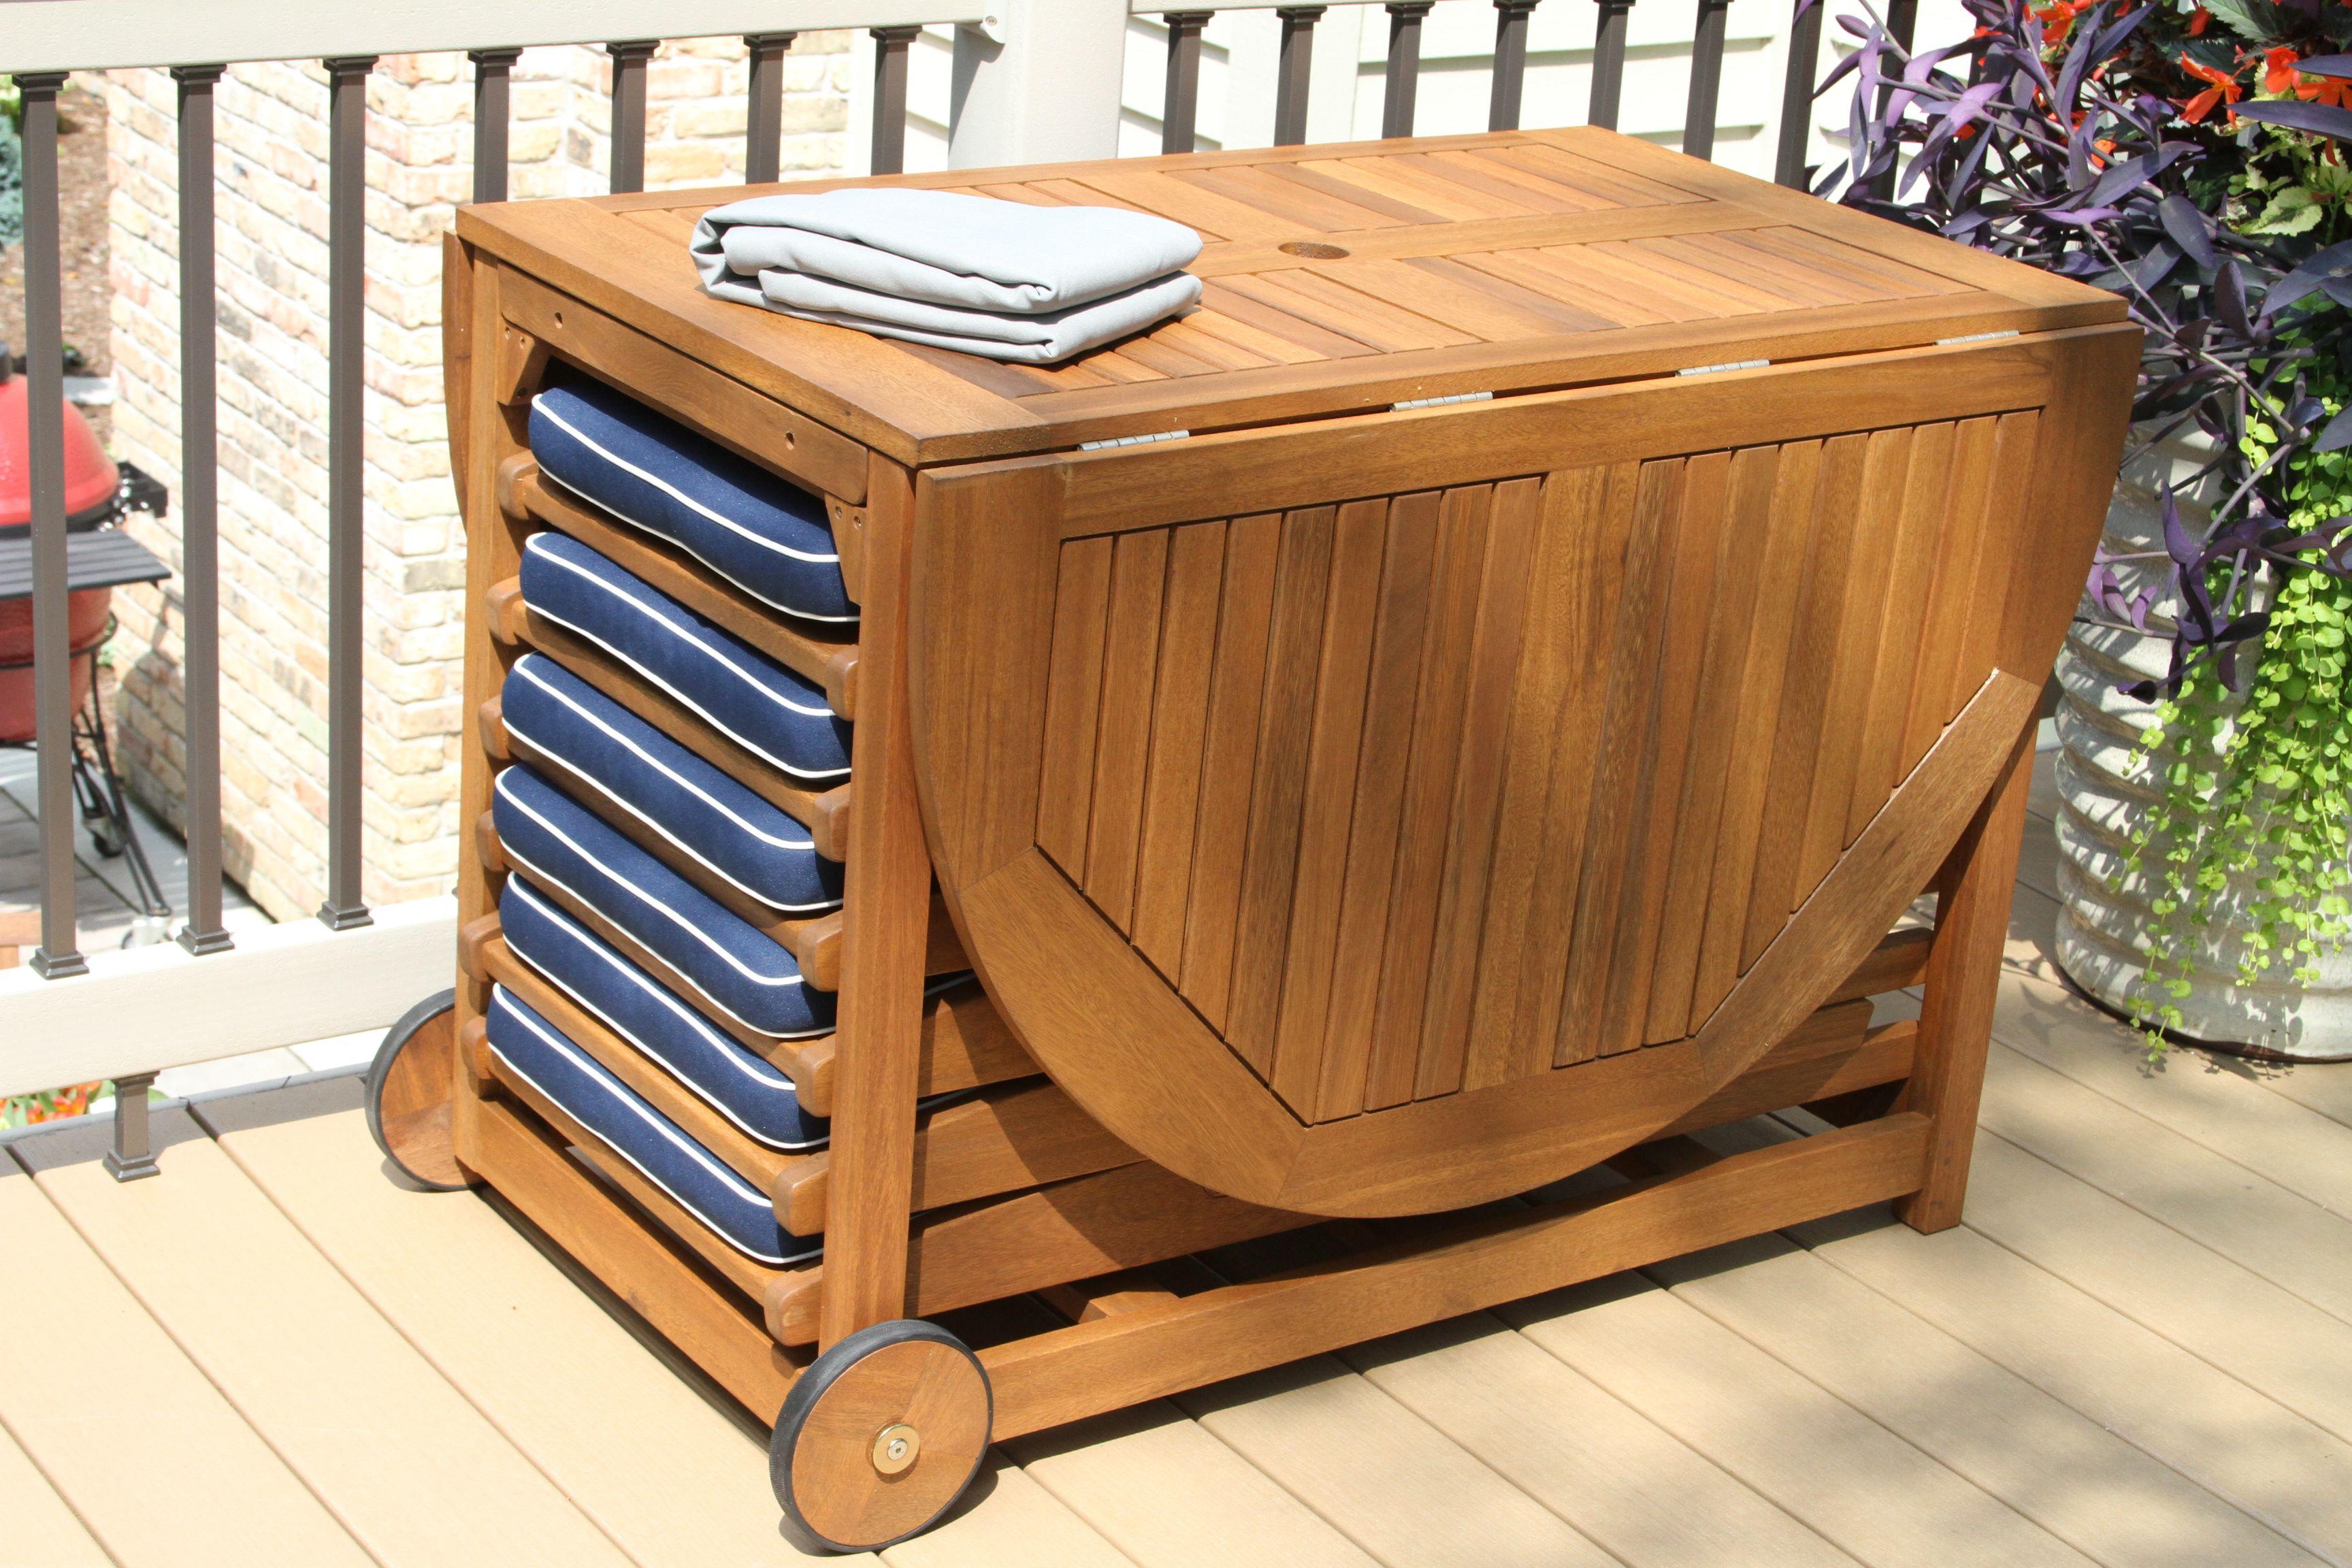 hardwood table set with blue cushions